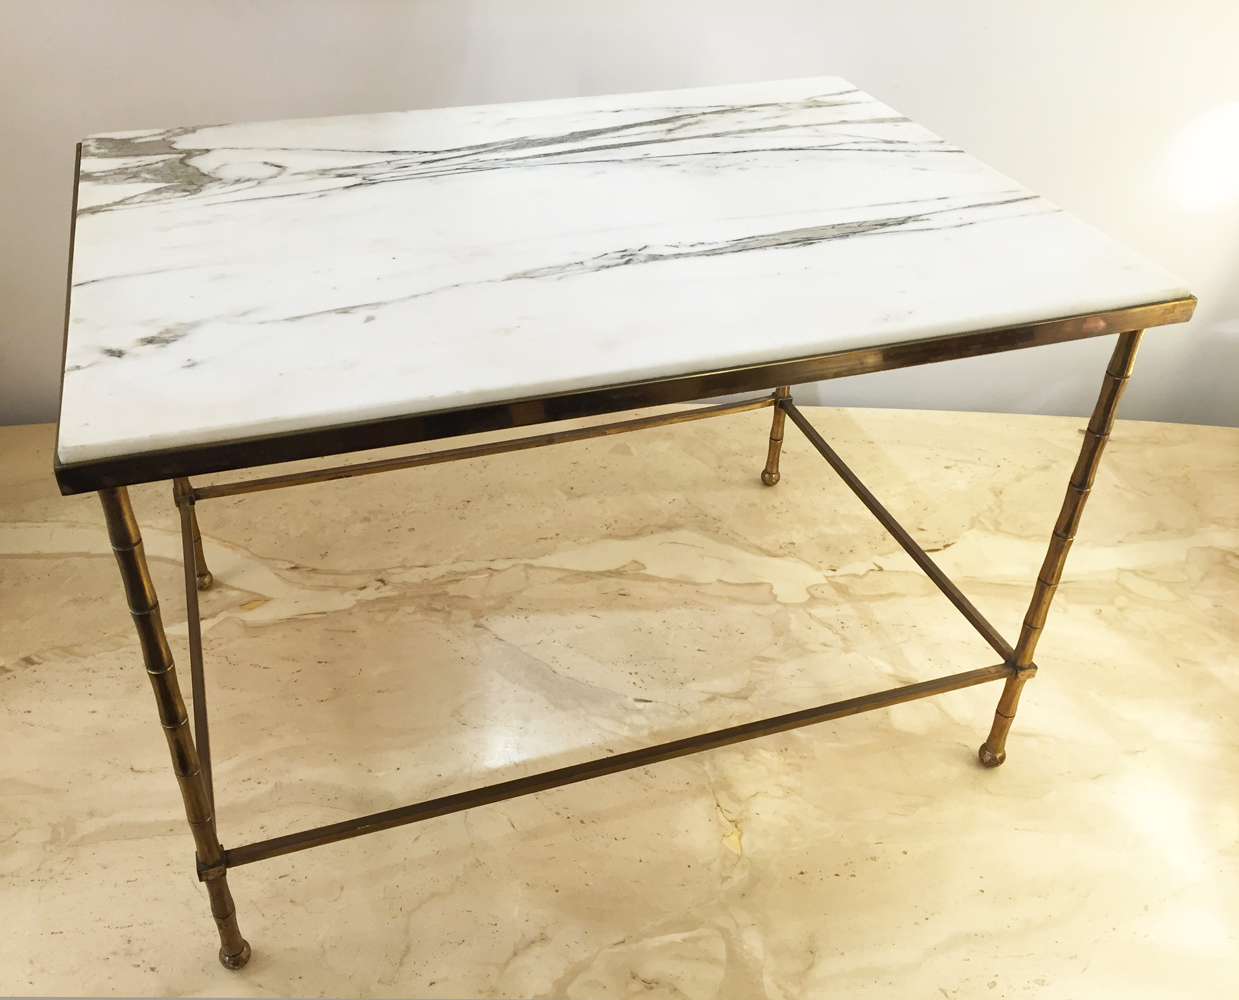 Table basse bronze marbre blanc n°1a